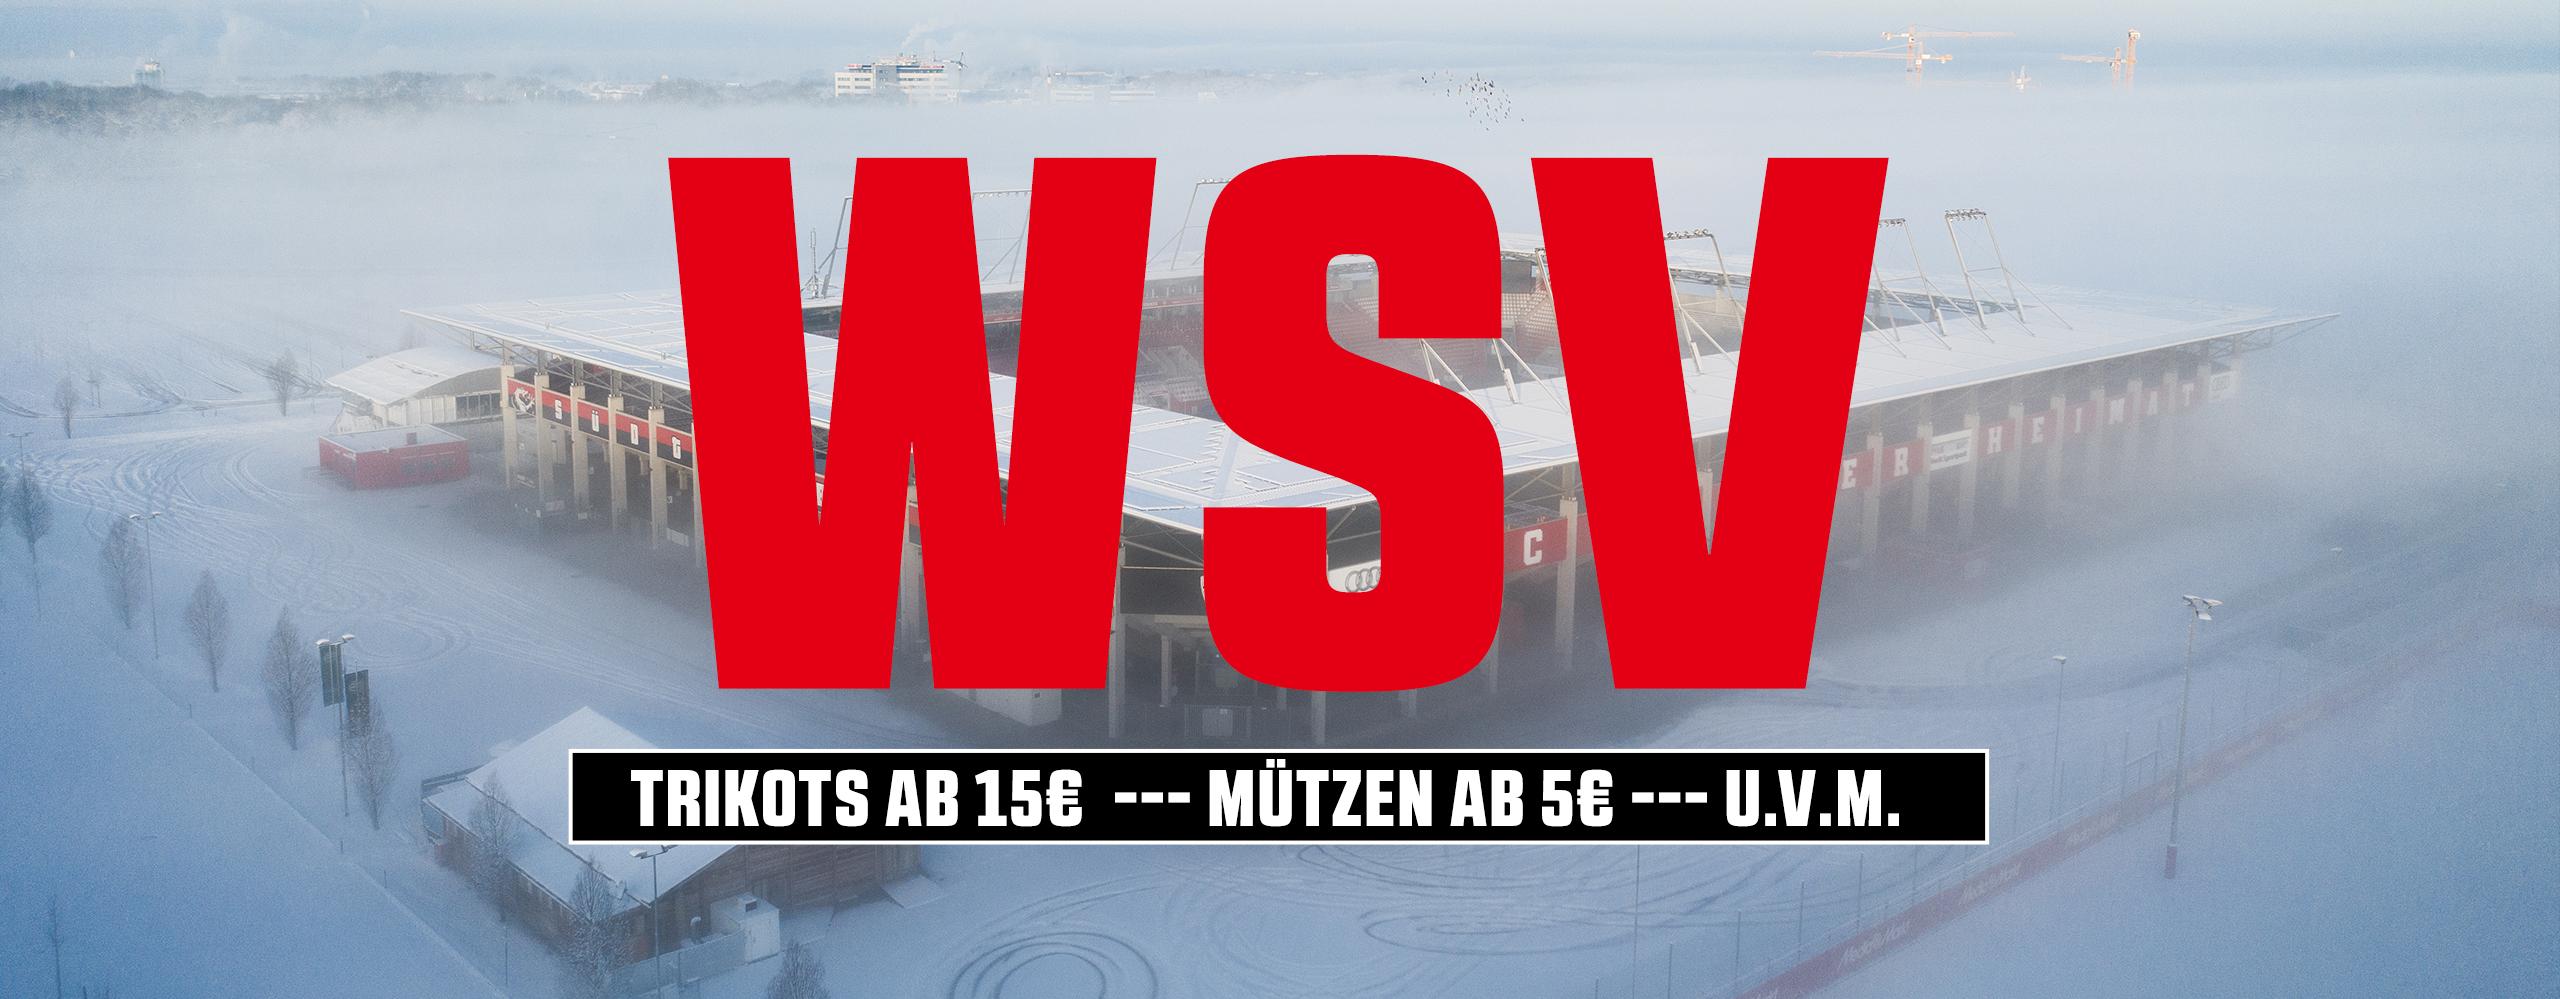 WSV 2021